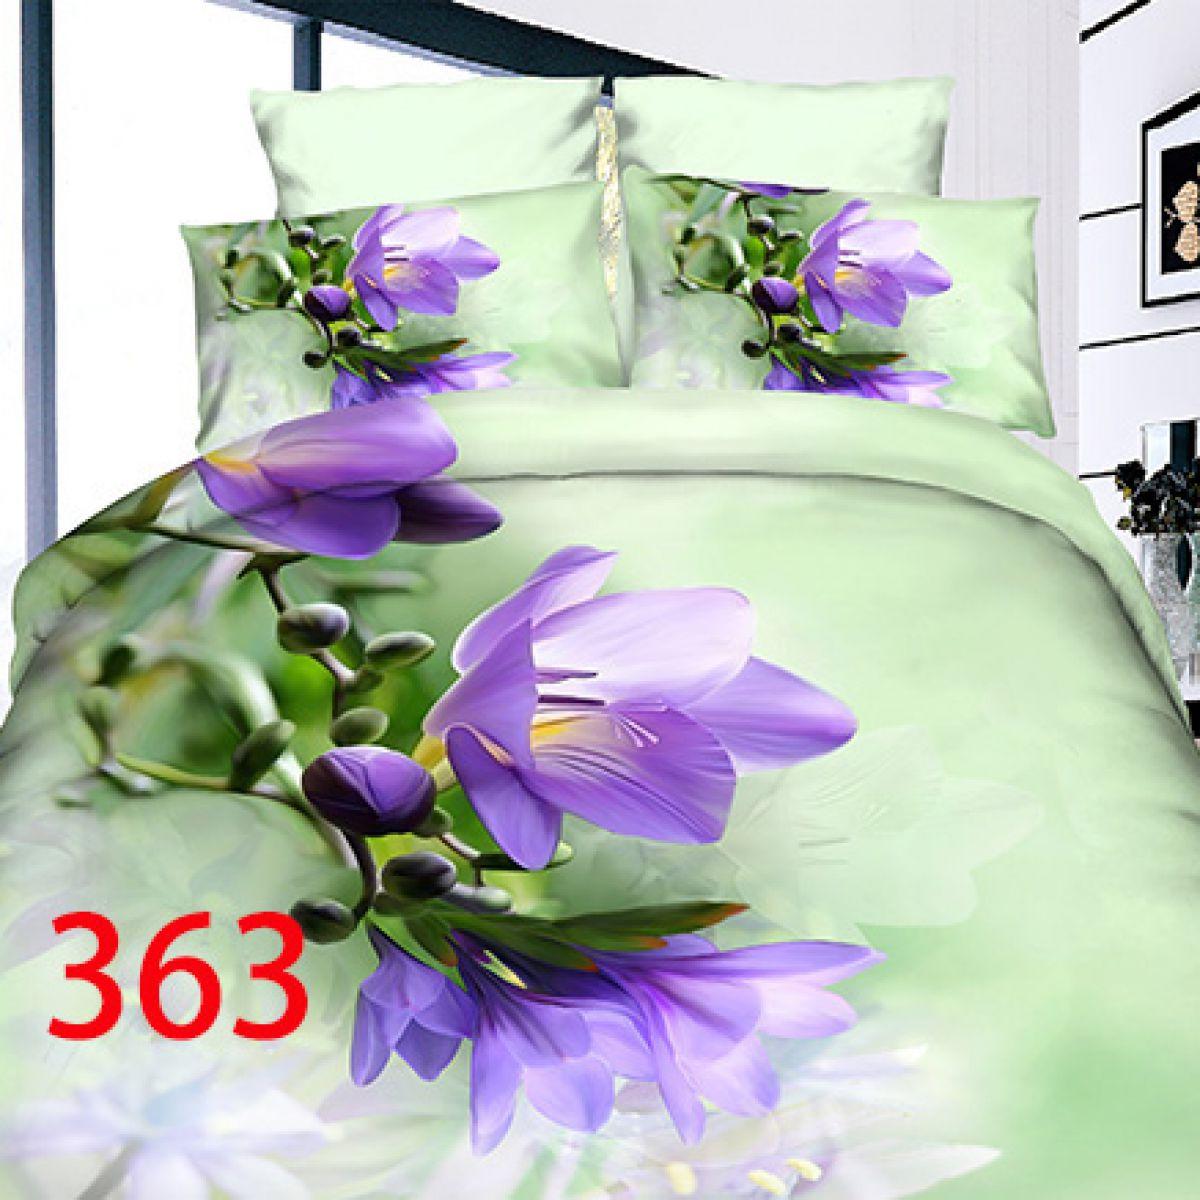 3D Beddings - Antonio - AML-363 - 160x200 cm - 4 pcs